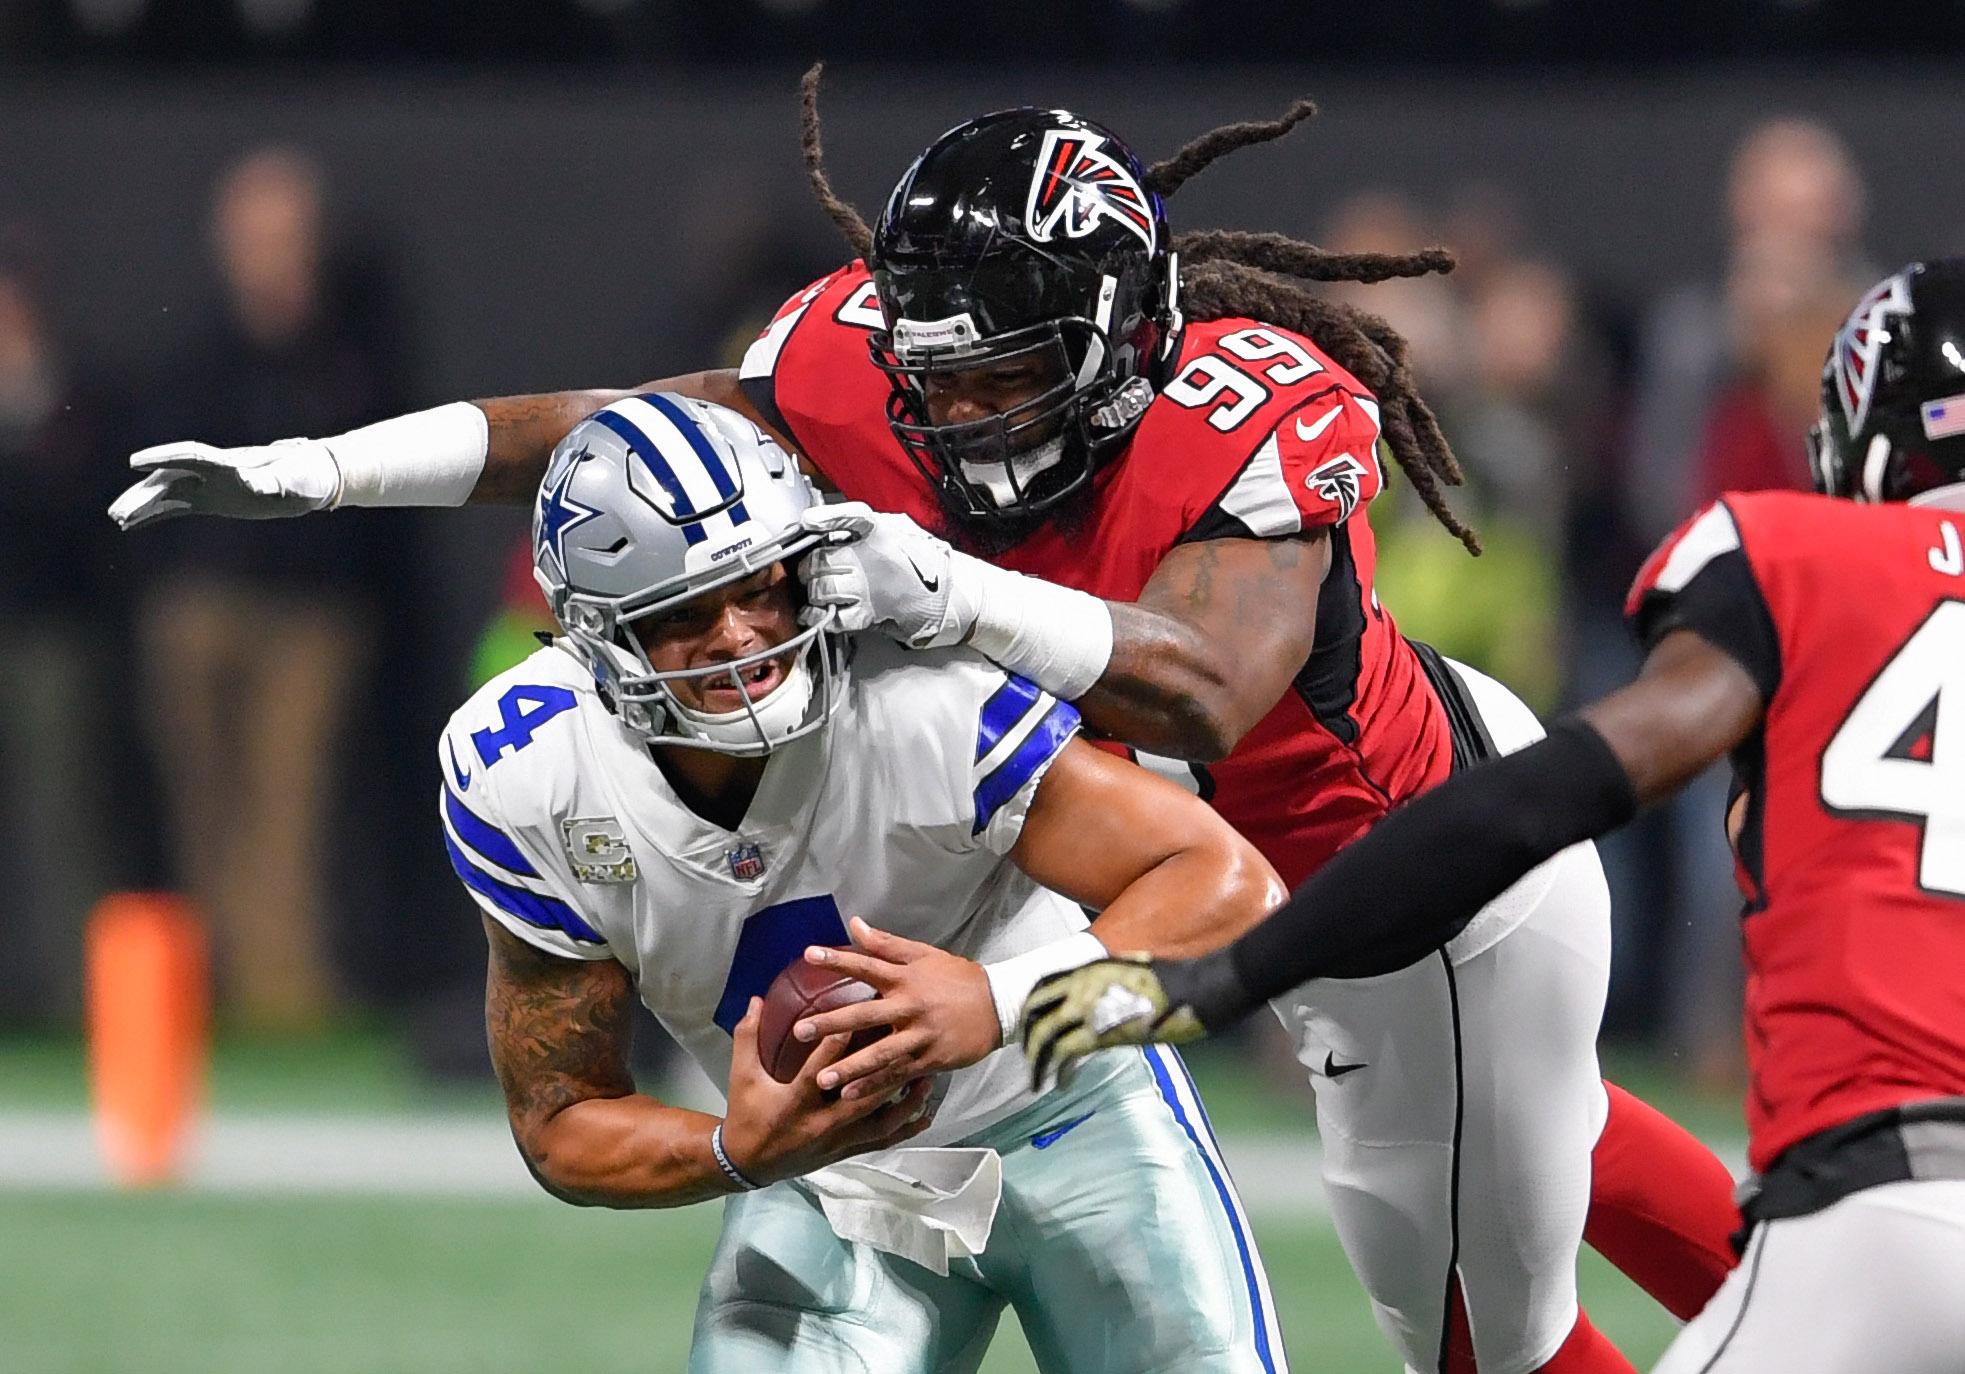 NFL: Dallas Cowboys at Atlanta Falcons